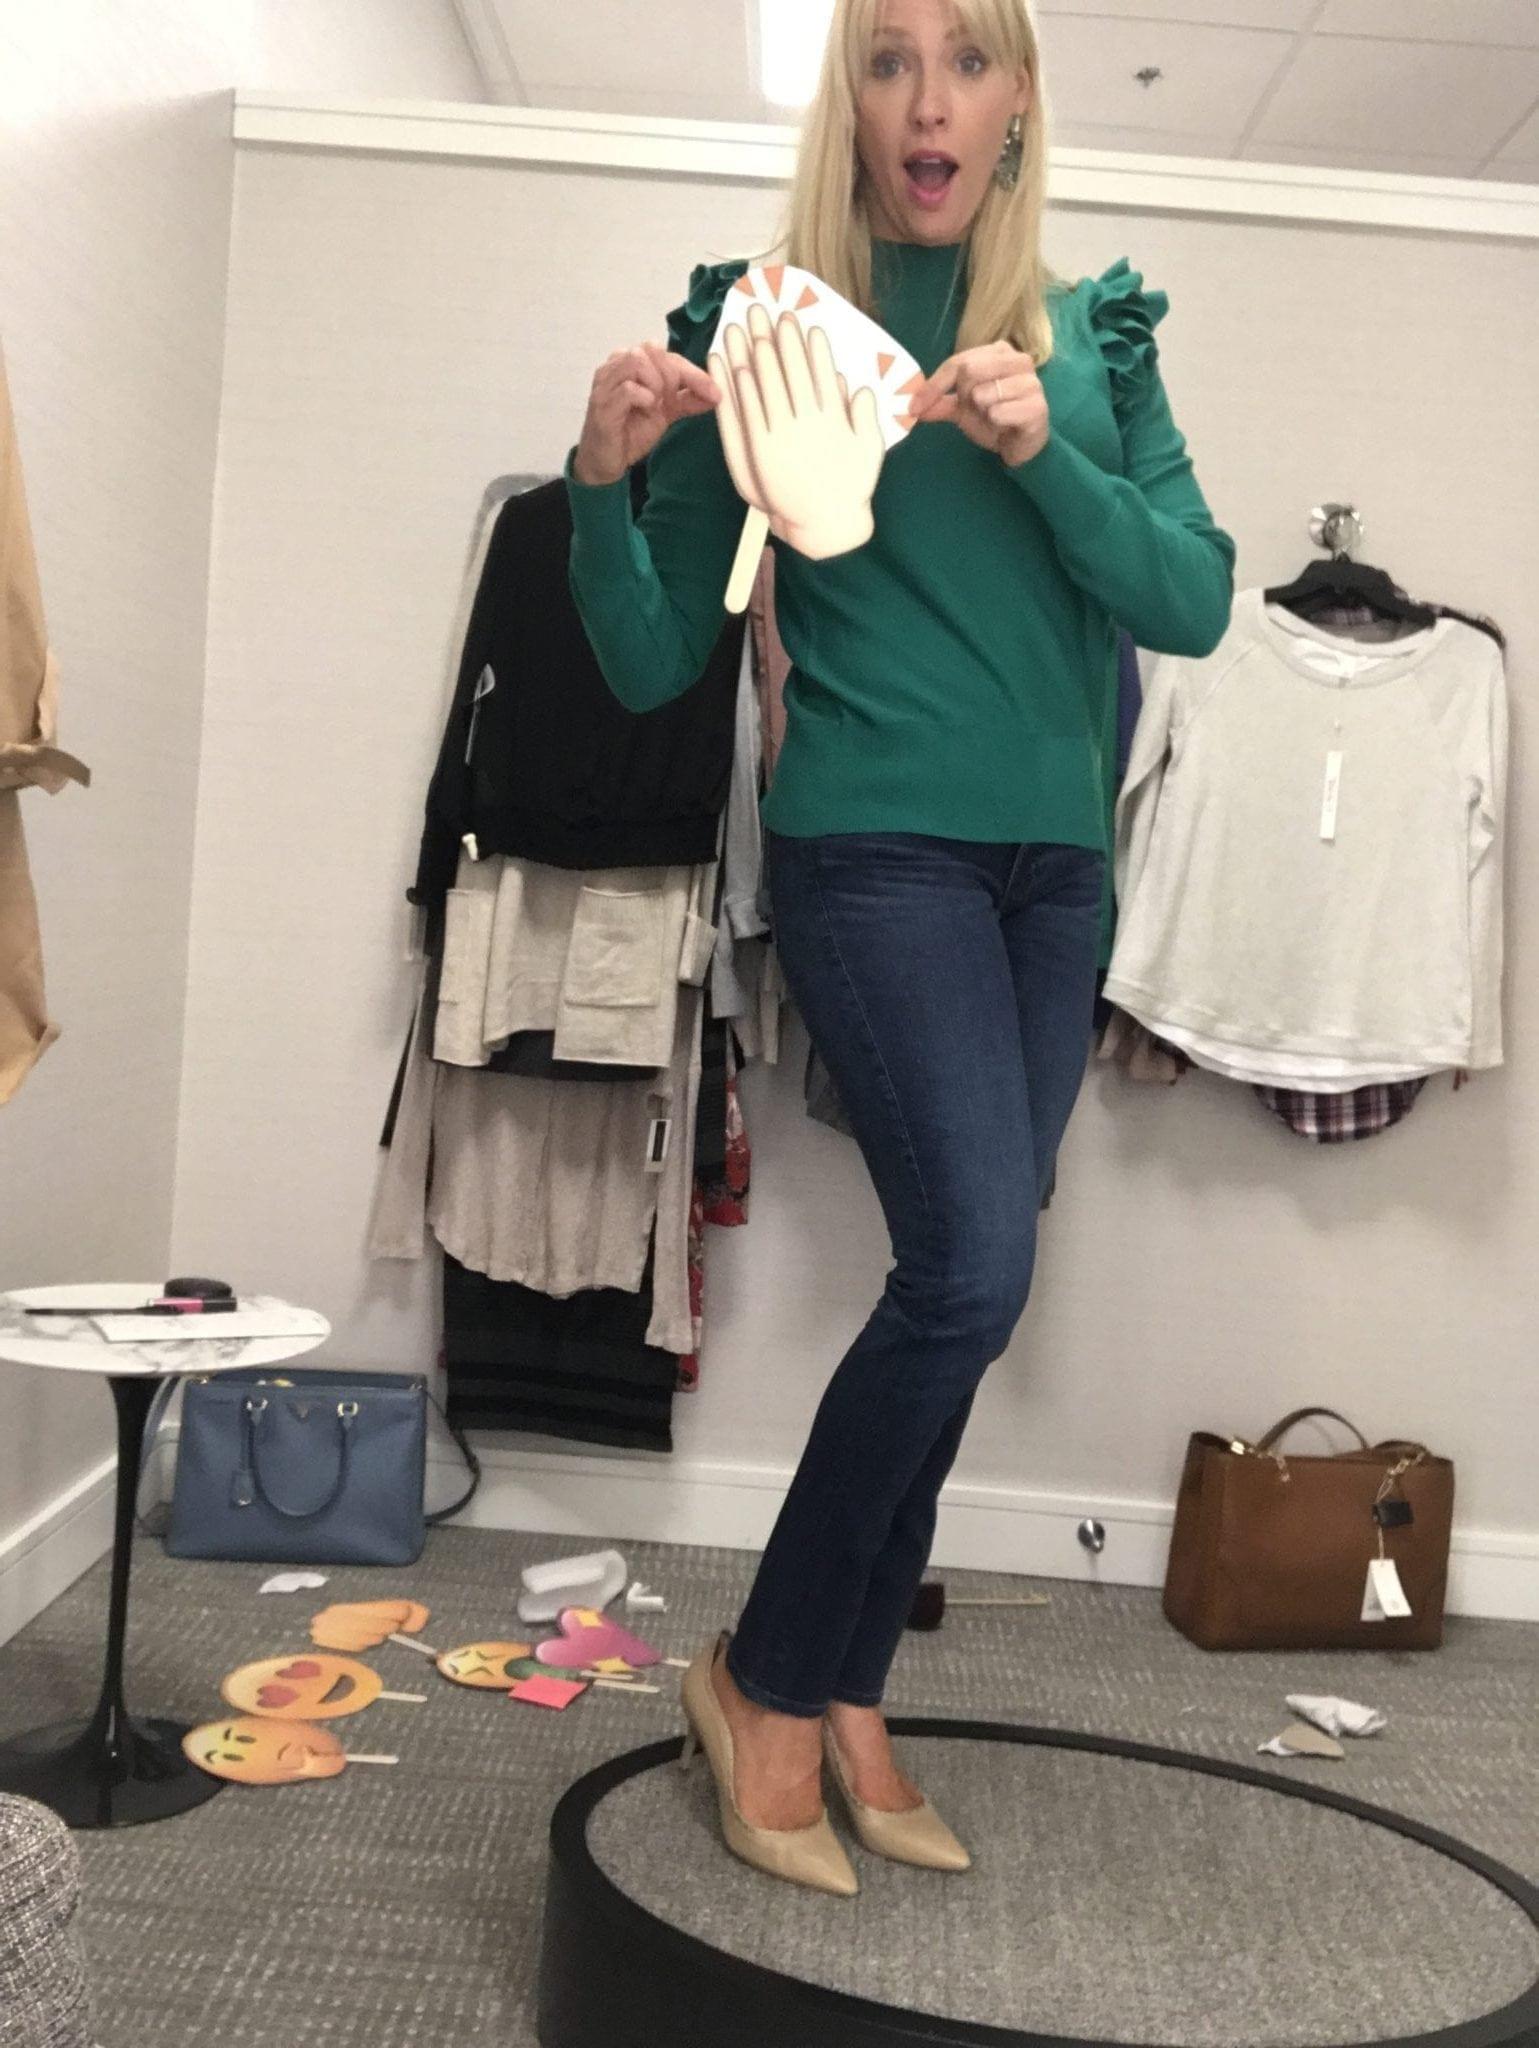 Green ruffle sweater for fall.